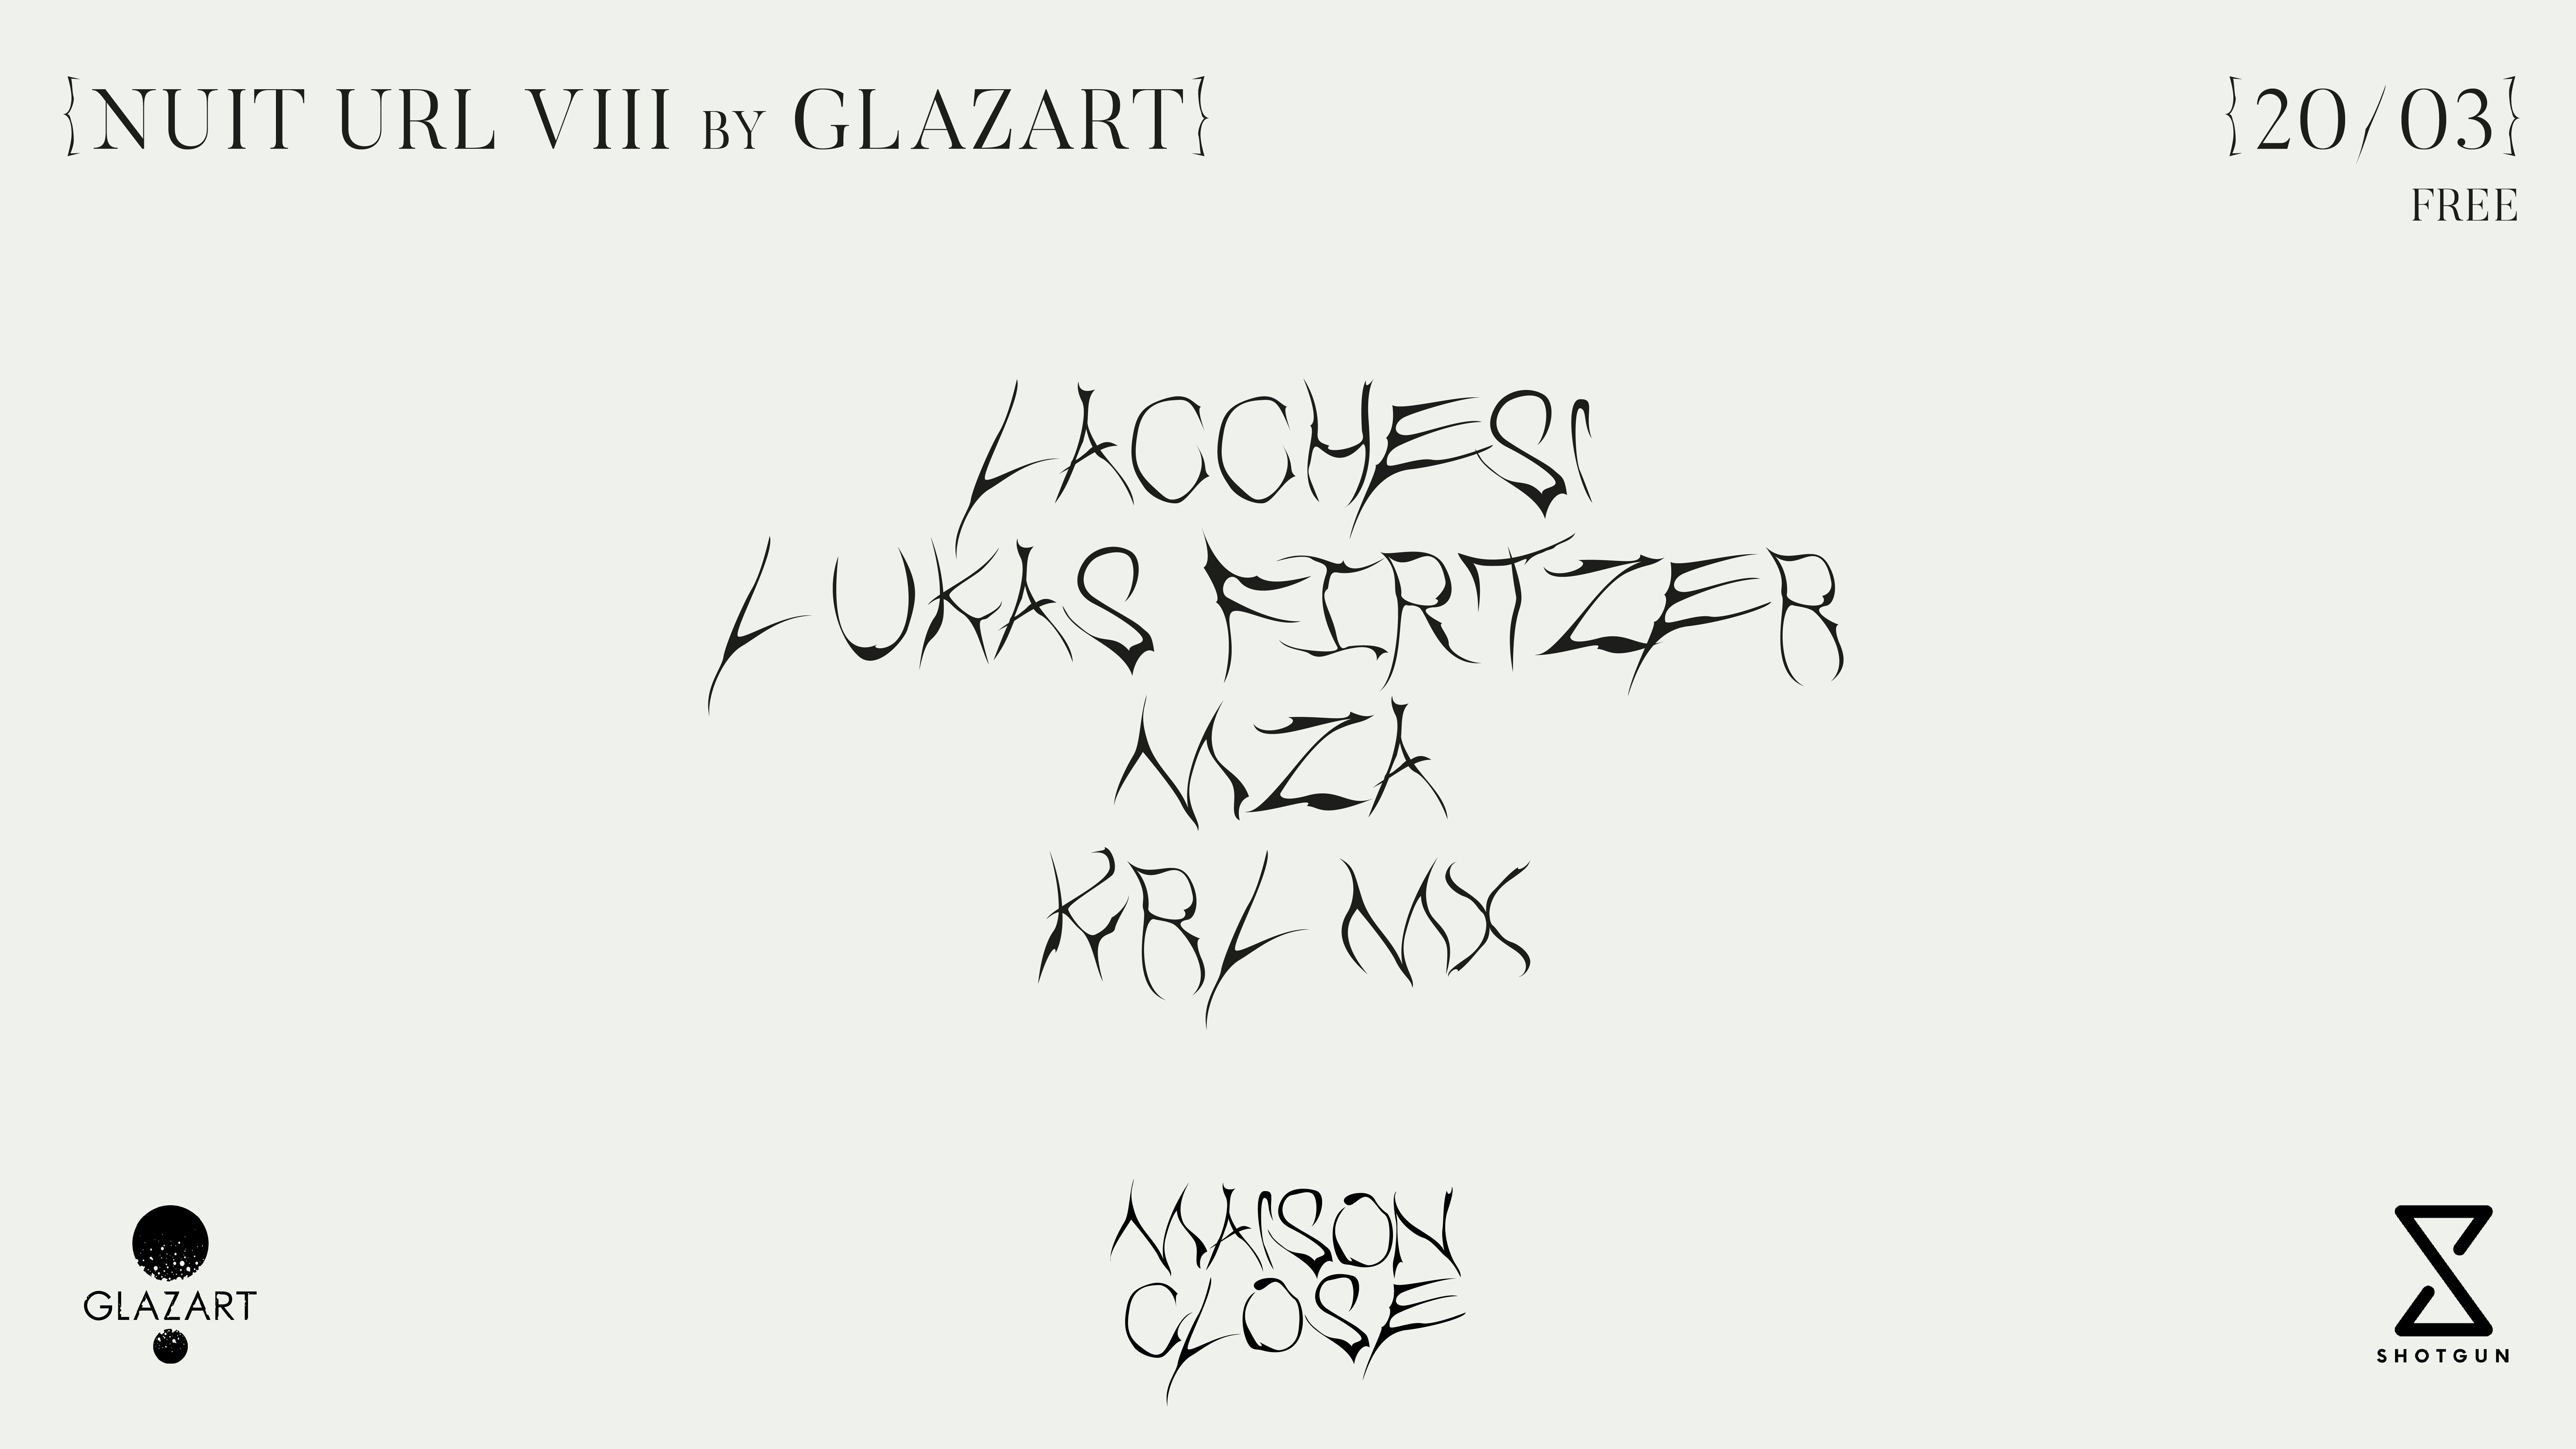 NUIT URL VIII w/ Lacchesi, Lukas Firtzer, MZA & Krl Mx